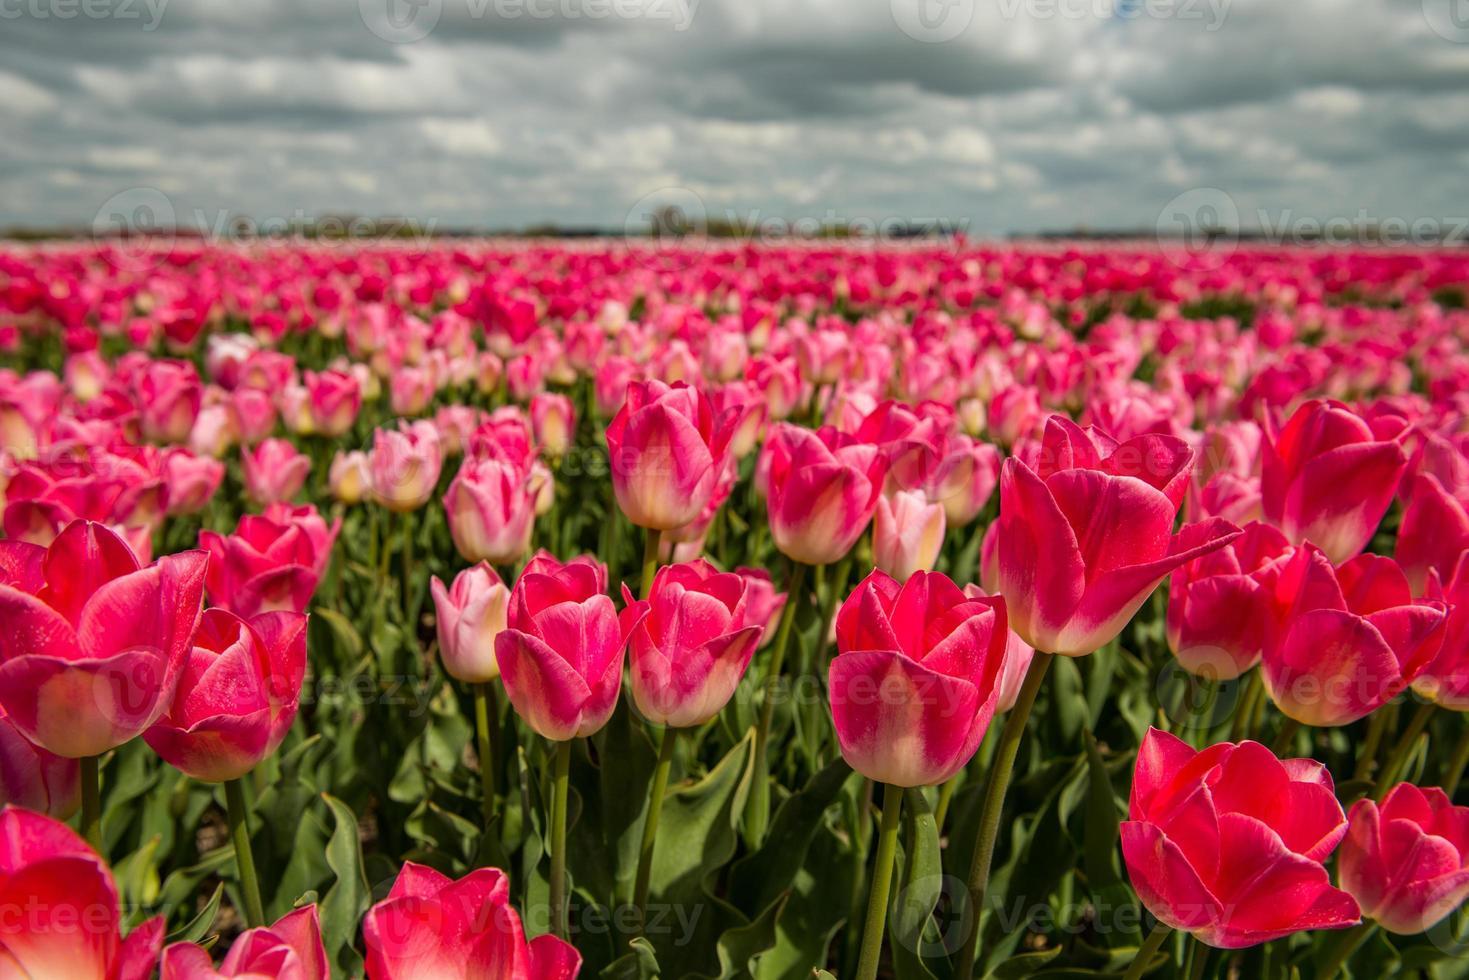 culture de tulipes, pays-bas photo